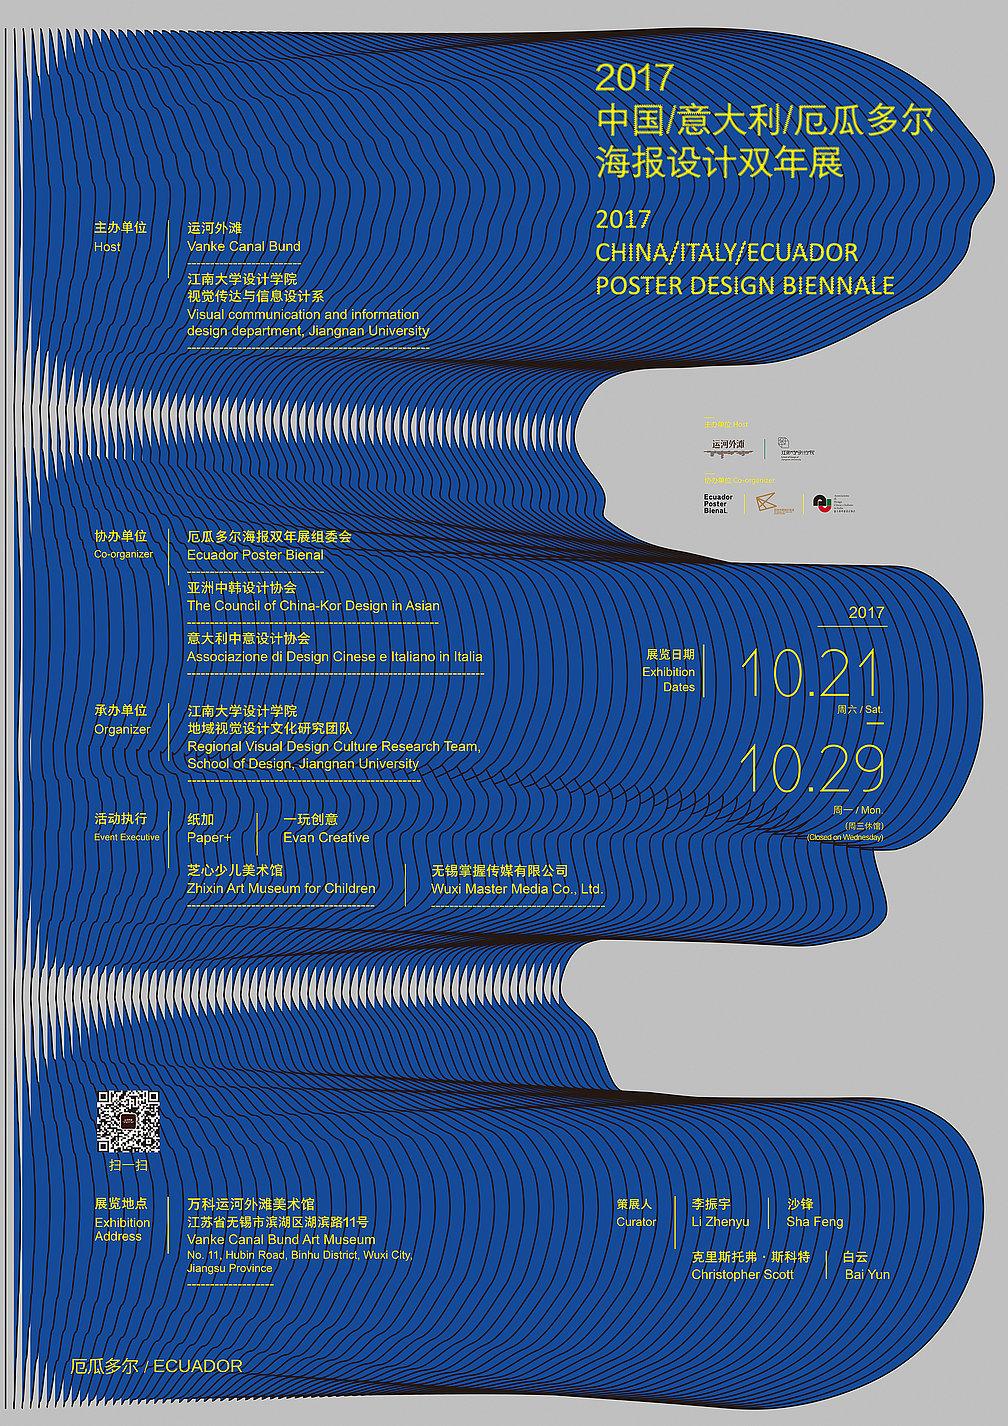 China/Italy/Ecuador Poster Design Biennale 2017 | Red Dot Design Award